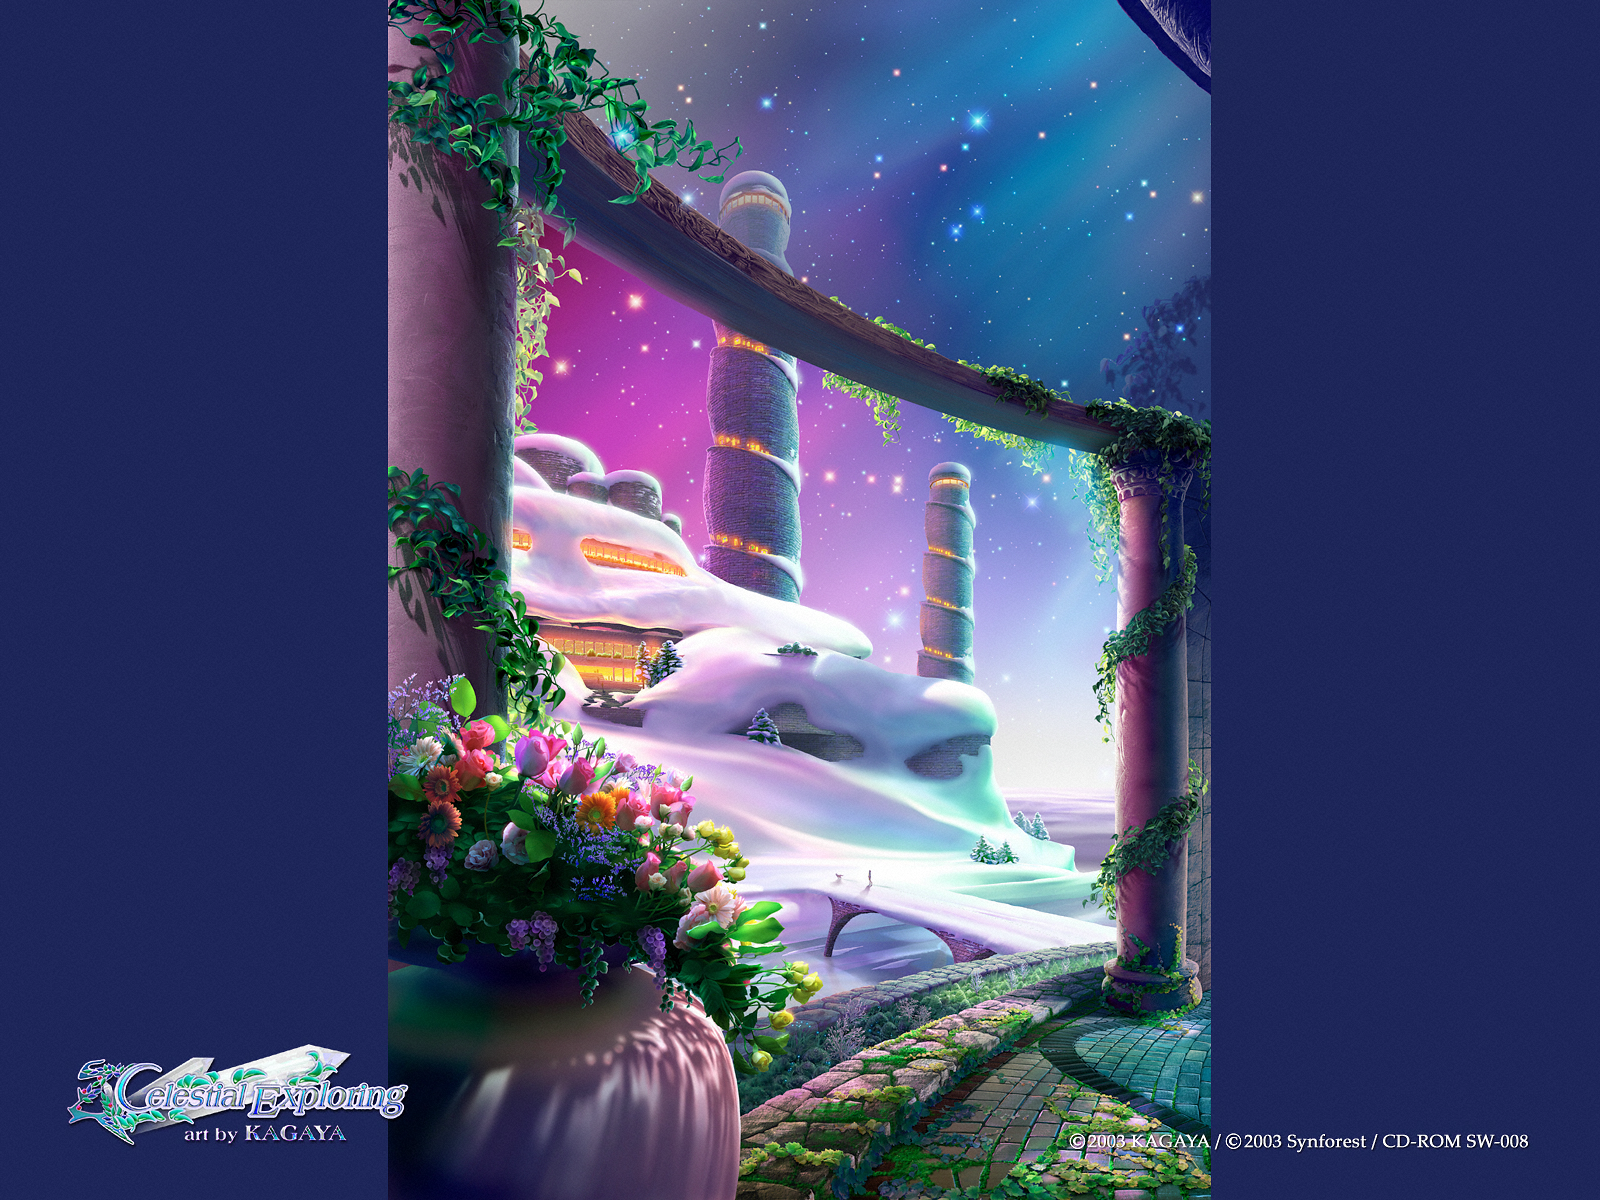 KAGAYA Celestial Exploring Passage, Serenity, Tranquillity